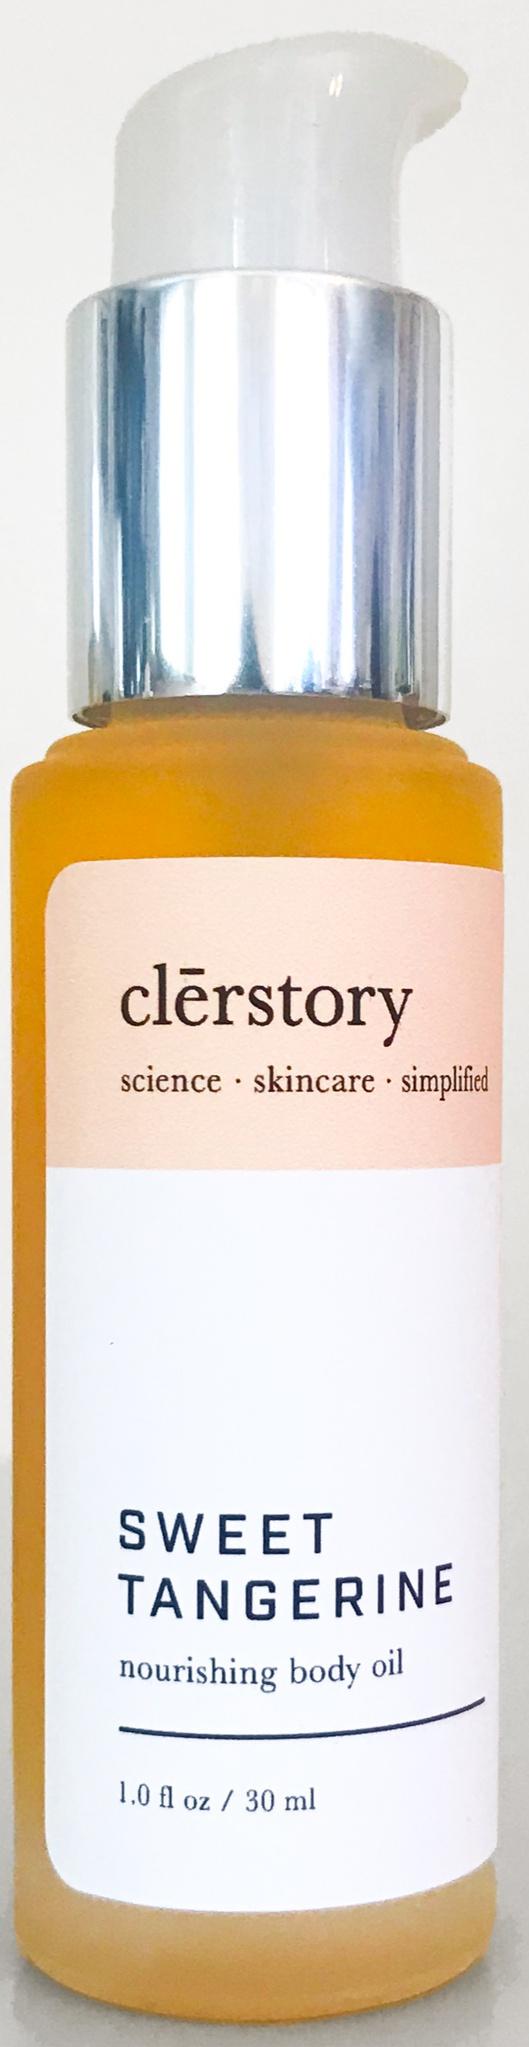 clērstory Sweet Tangerine Nourishing Body Oil